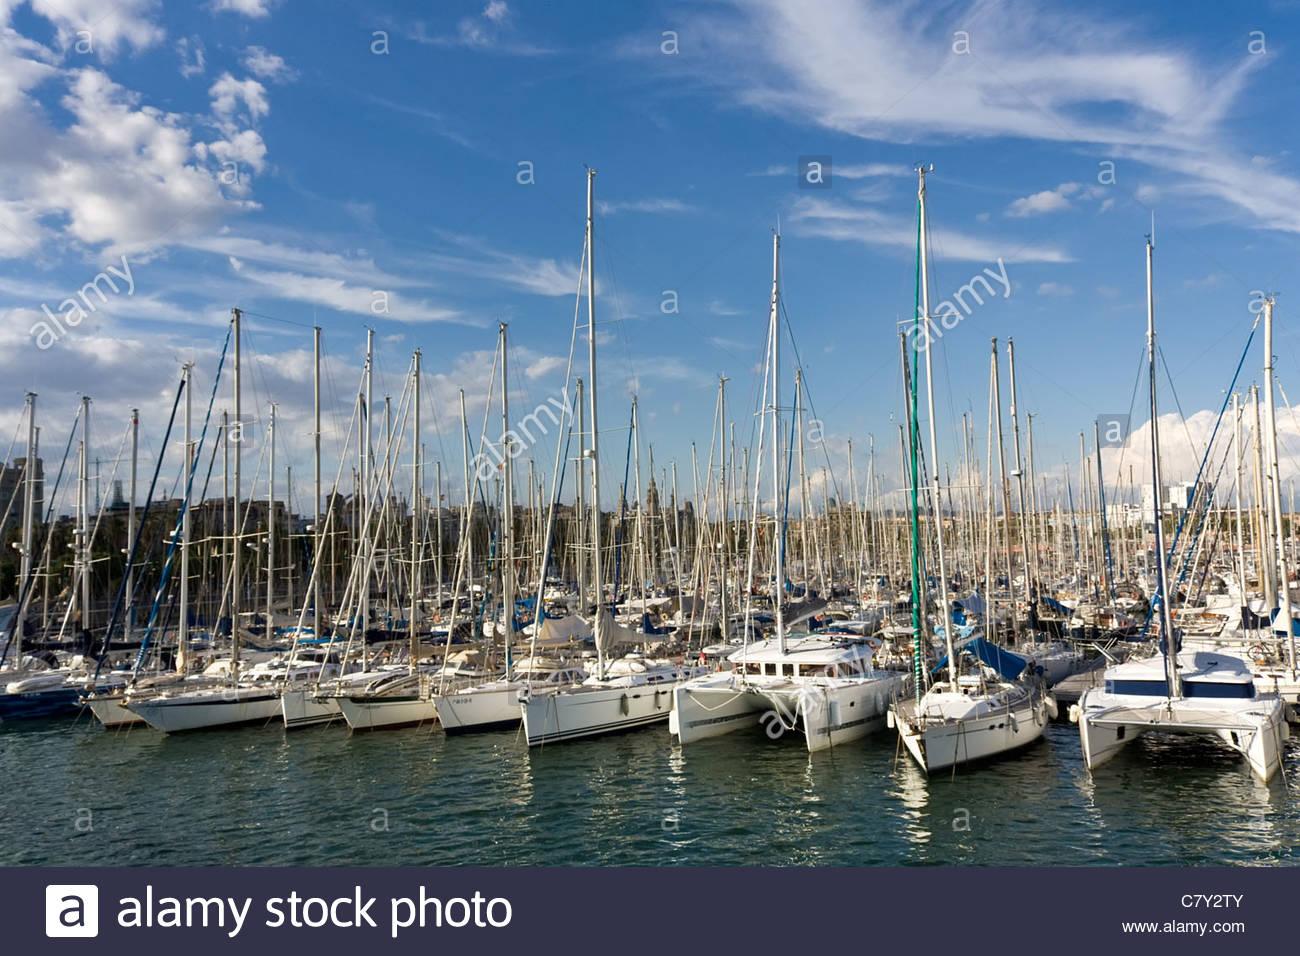 Yachts moorage in Barcelona - Stock Image